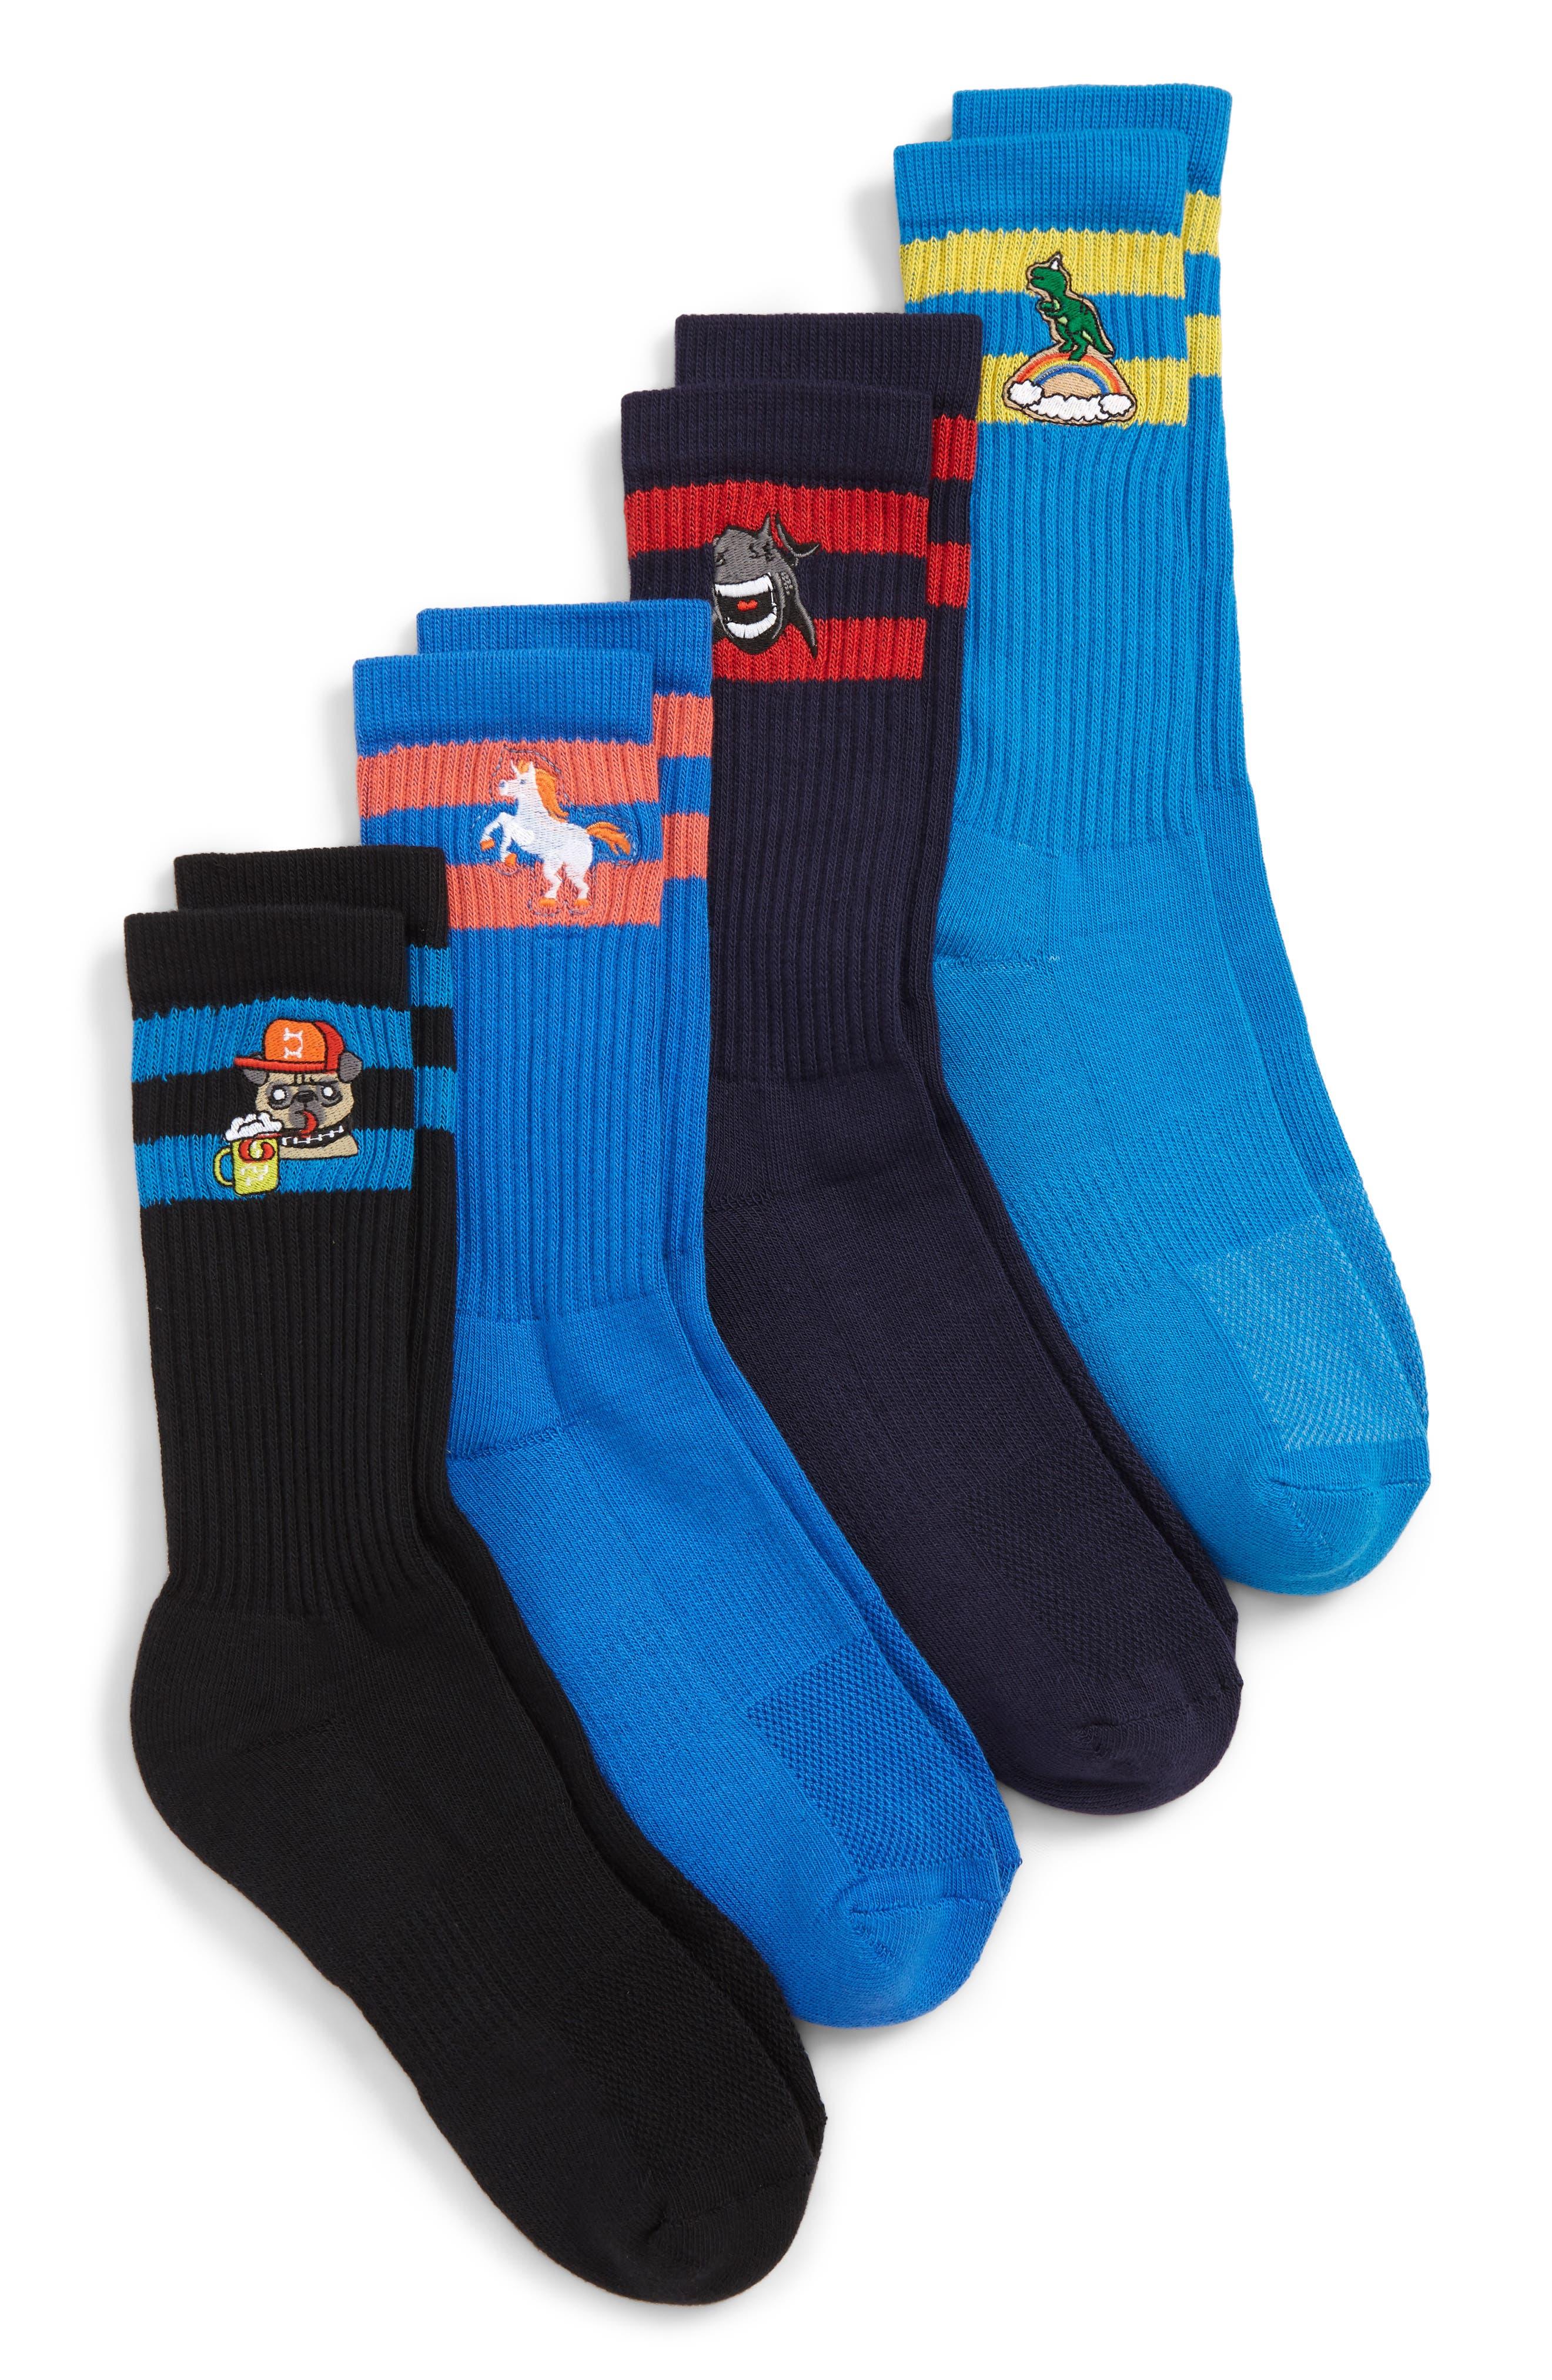 Icon 4-Pack Socks,                             Main thumbnail 1, color,                             BLACK/ NAVY/ BLUE ICONS